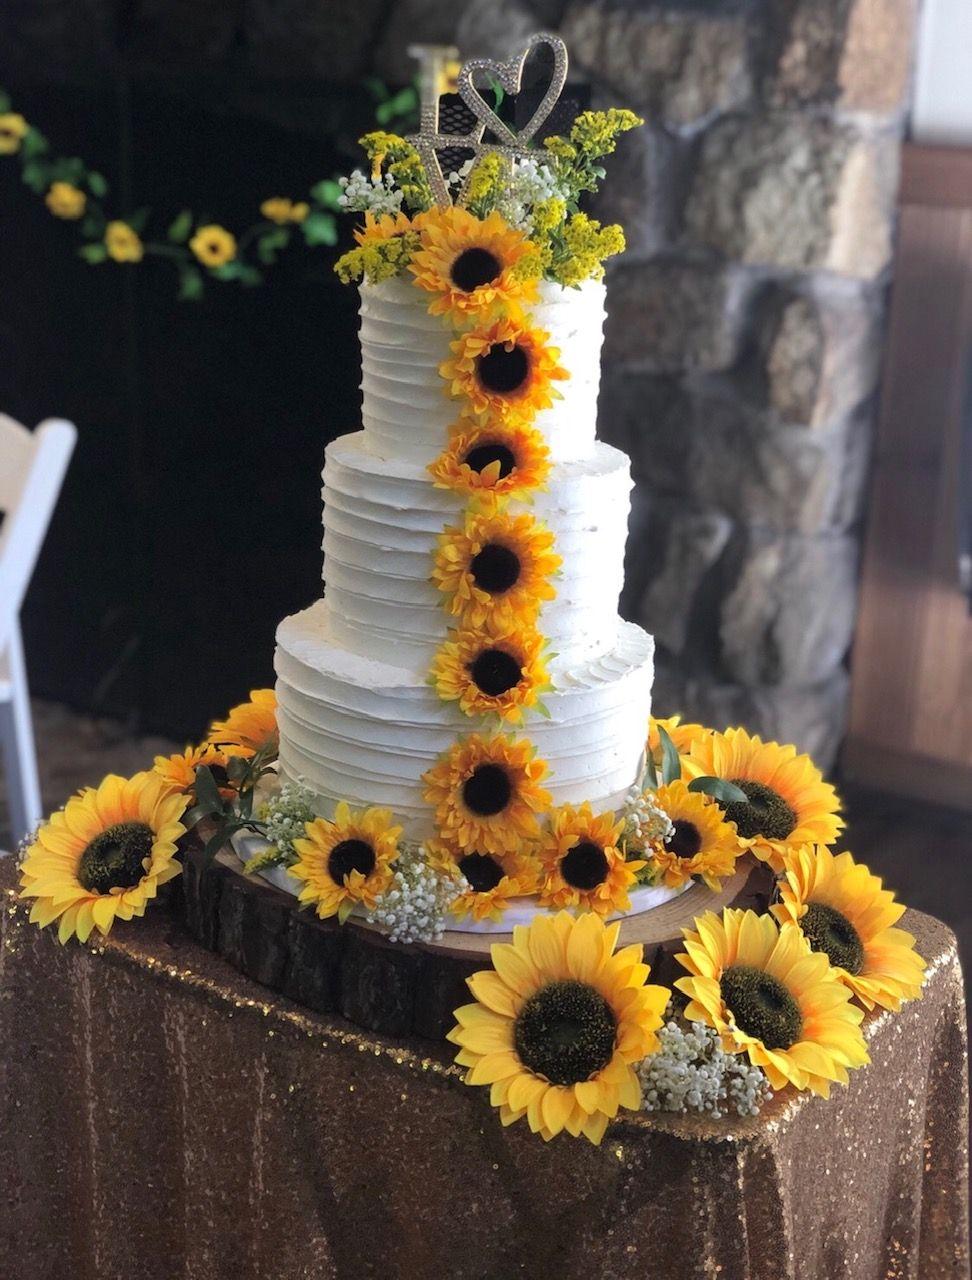 25 ideas wedding cakes rustic fall   Sunflower themed